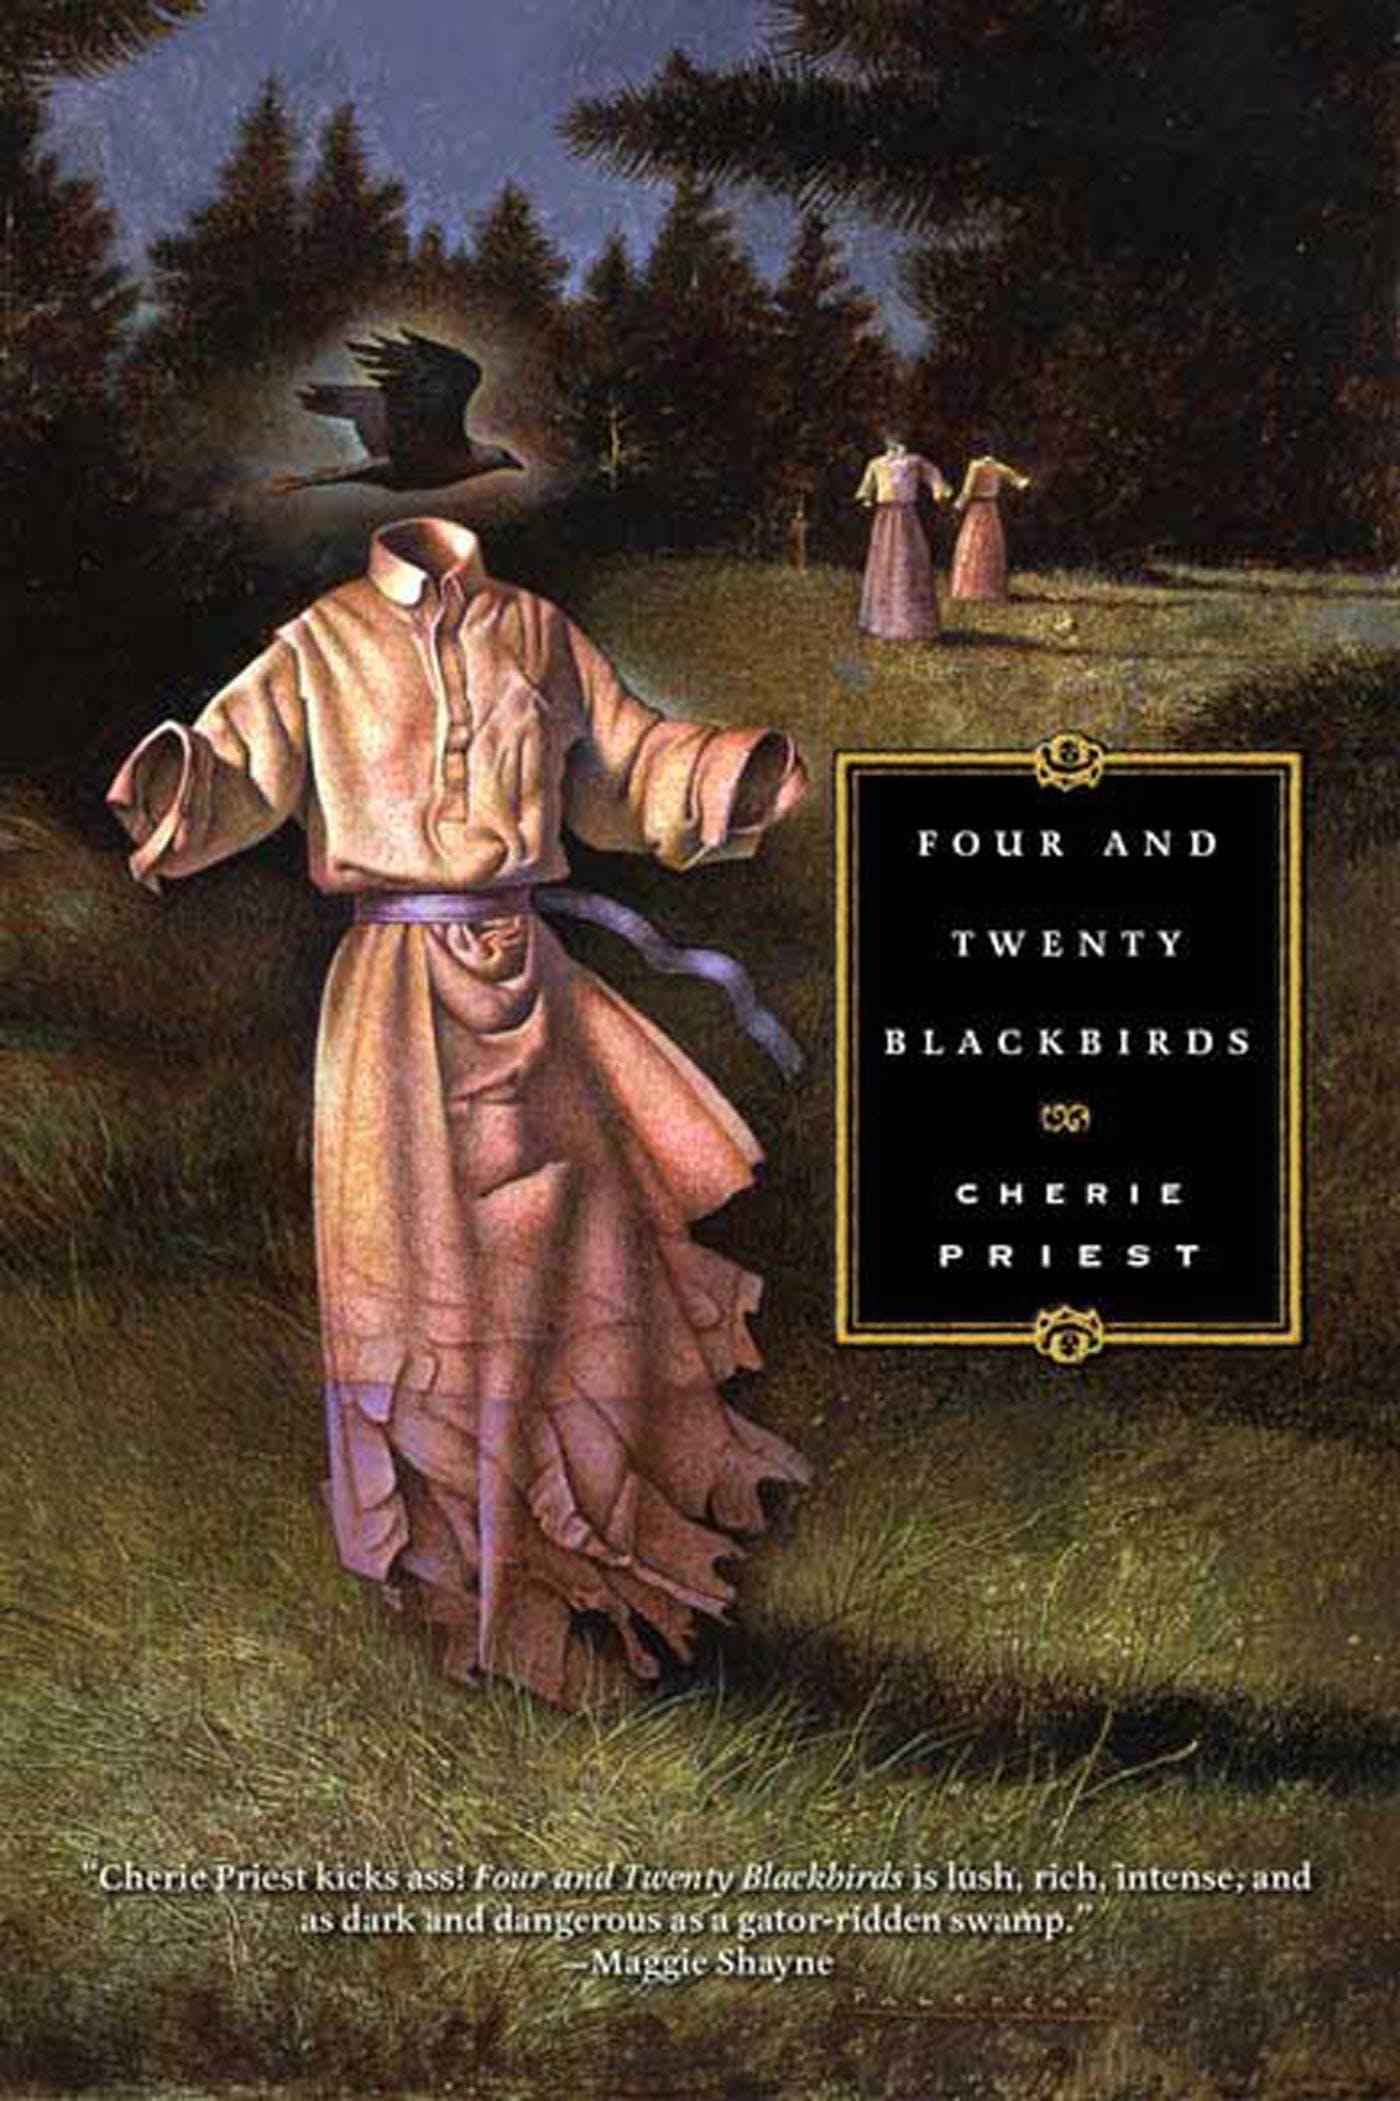 Image of Four and Twenty Blackbirds